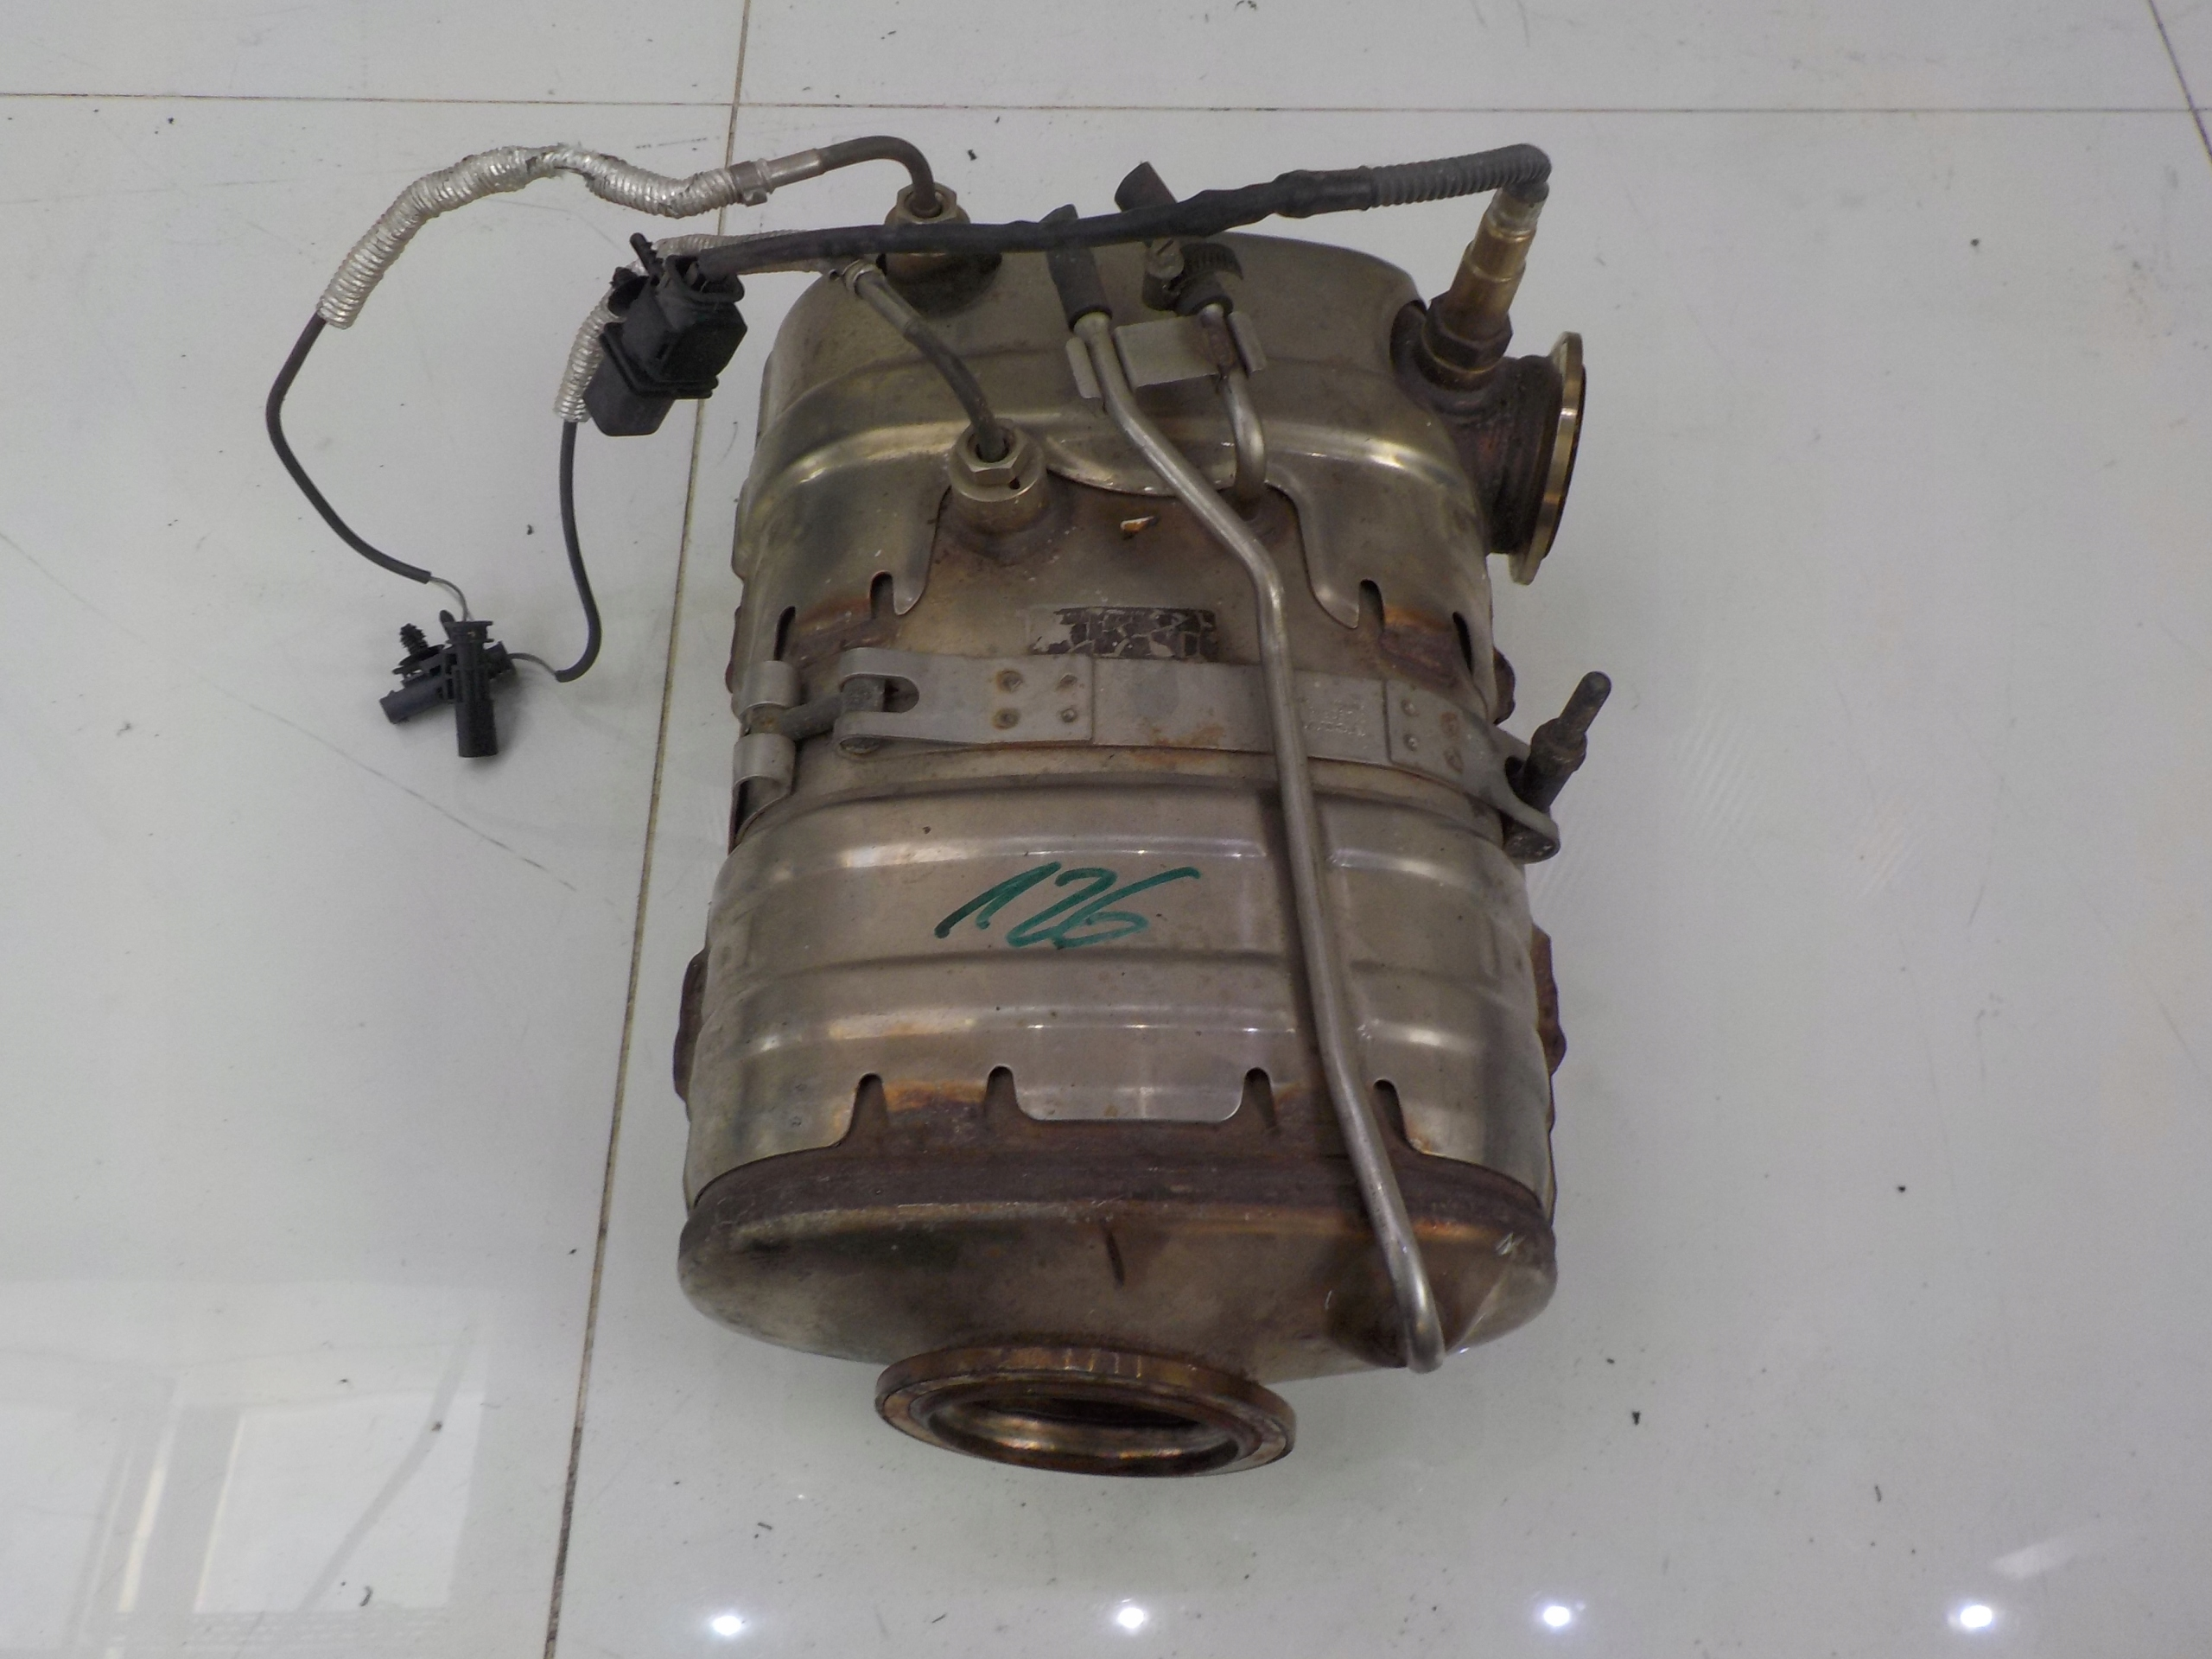 Volvo S40 filtr cząsteczek katalizator 31293464*